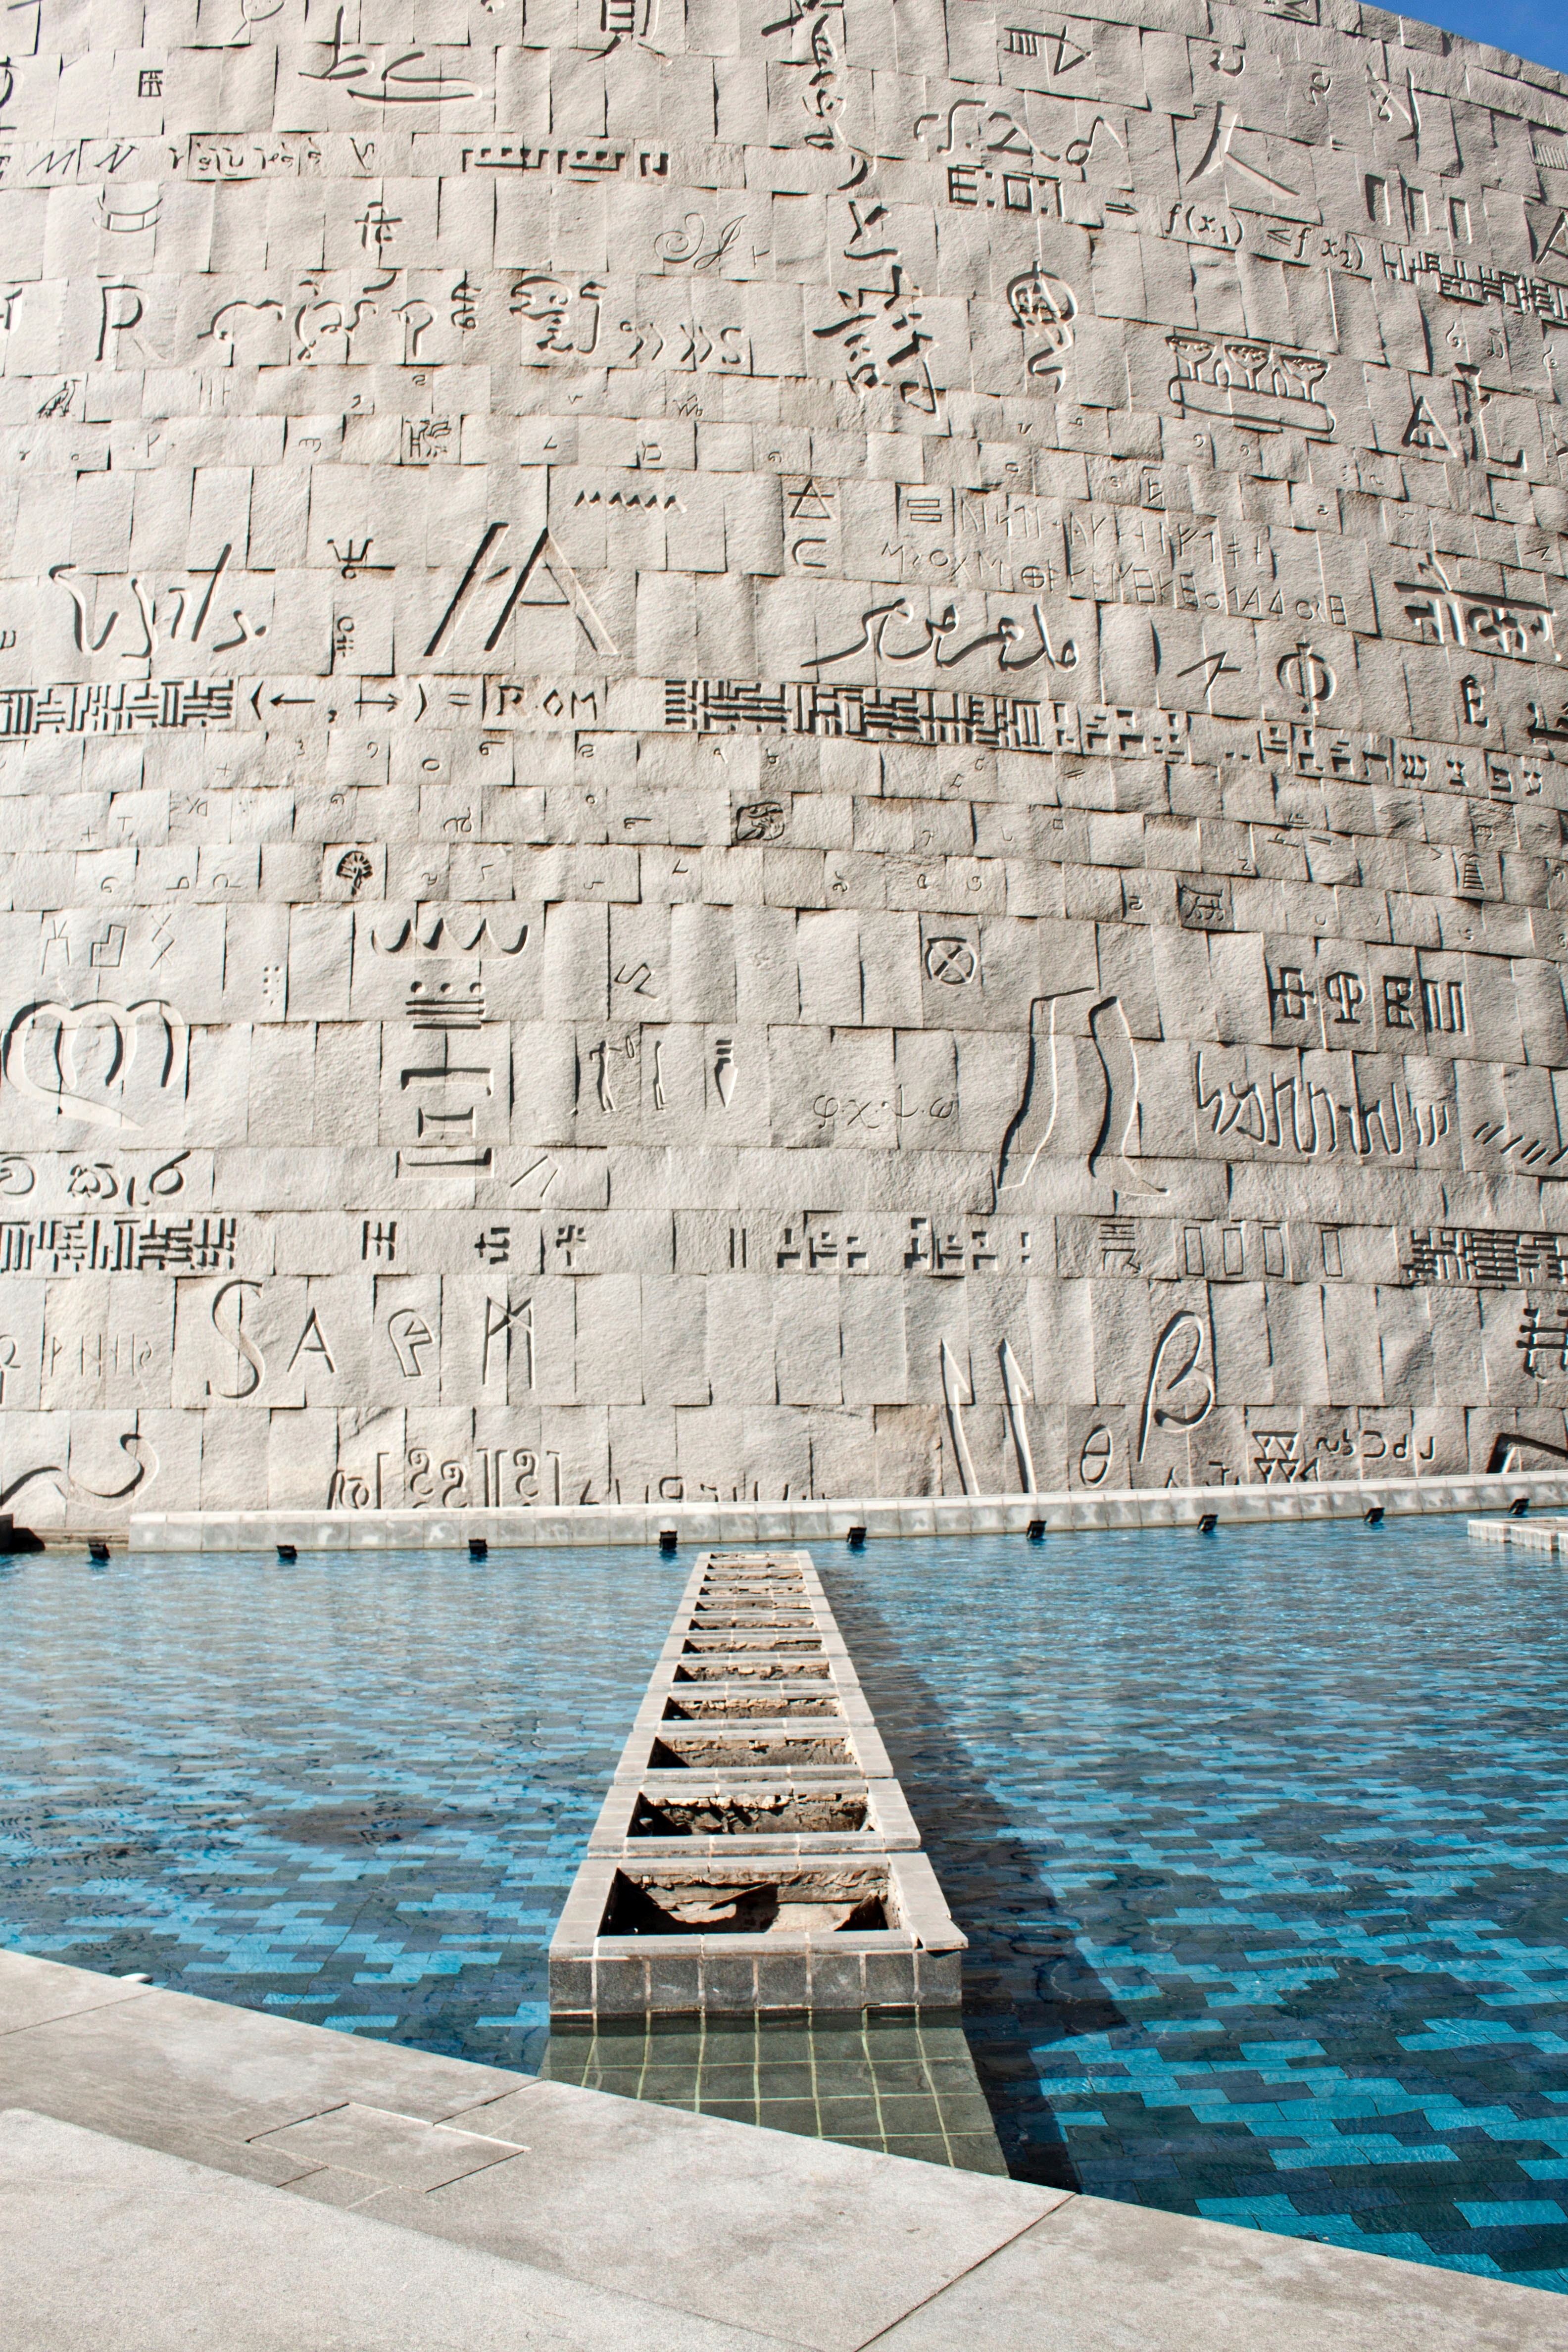 Swimming pool near concrete wall photo